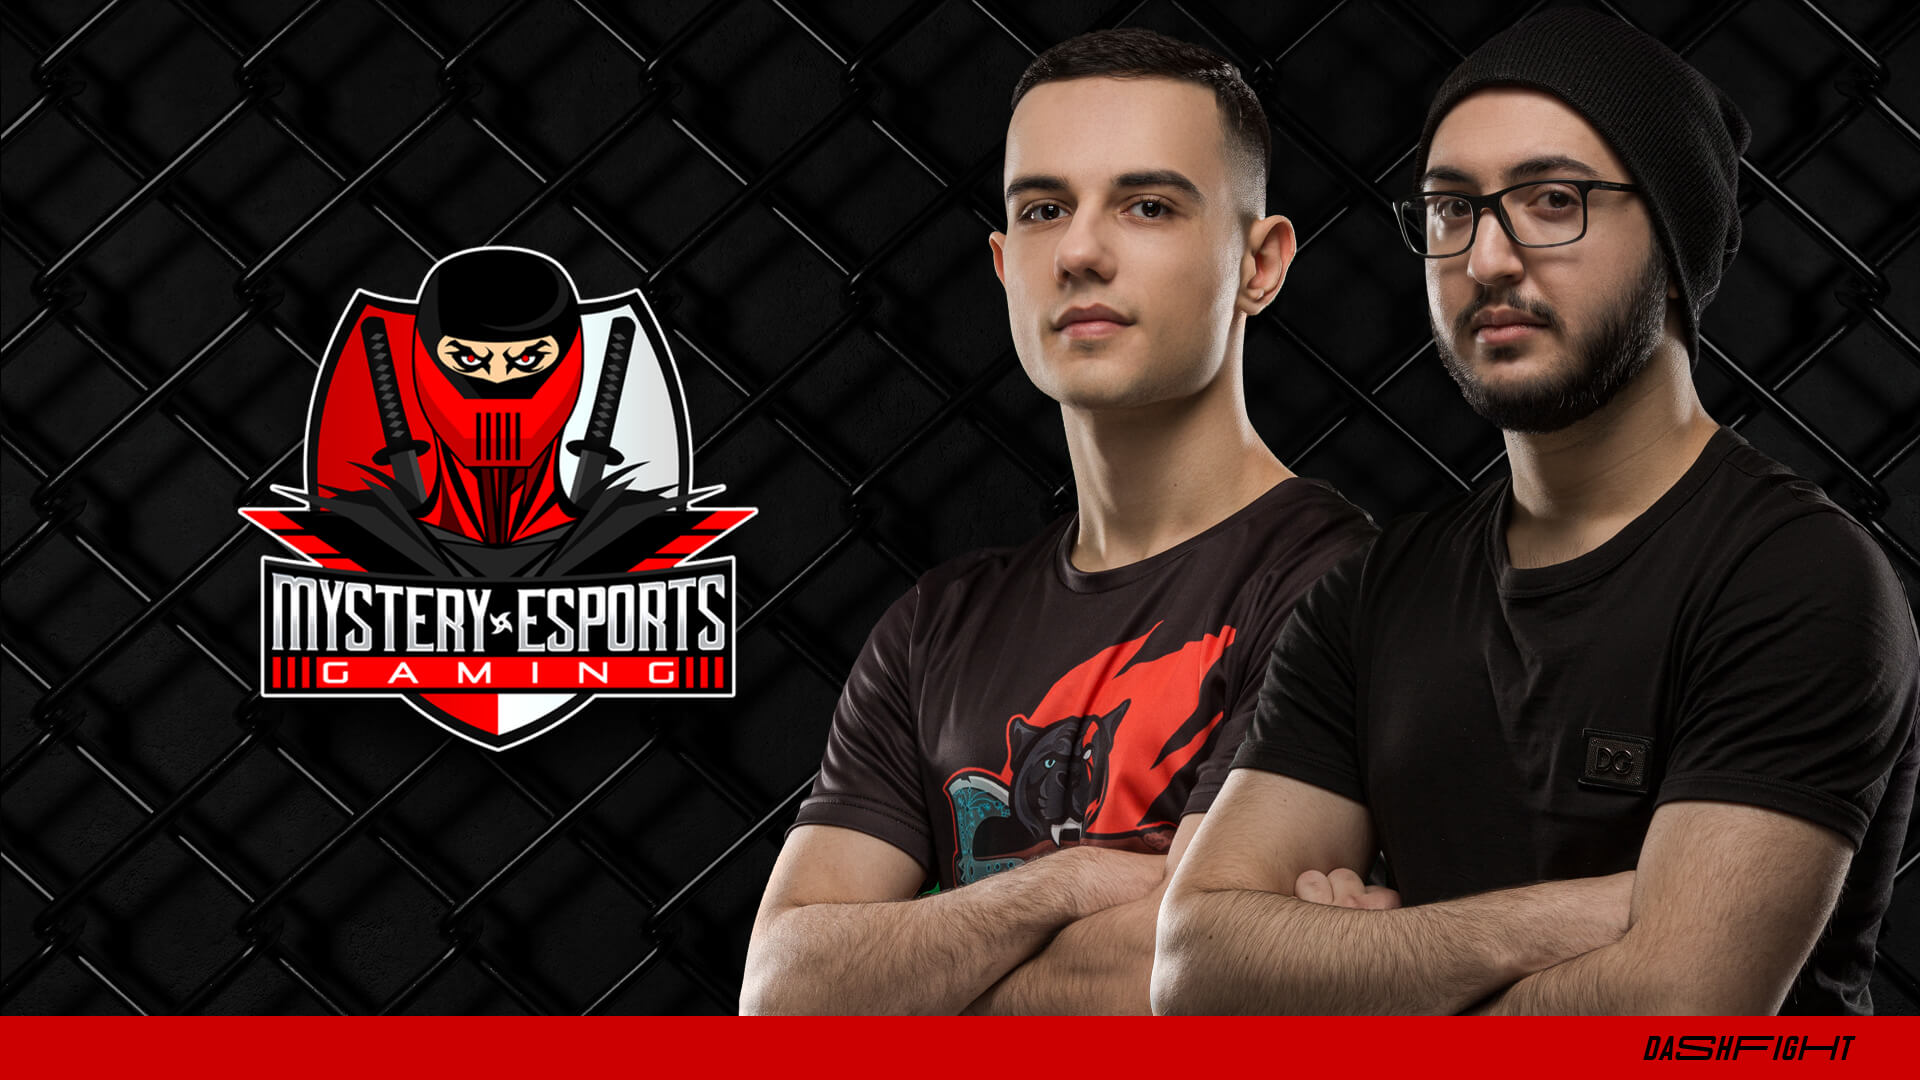 Arnkratos and MK_Azerbaijan of MCG